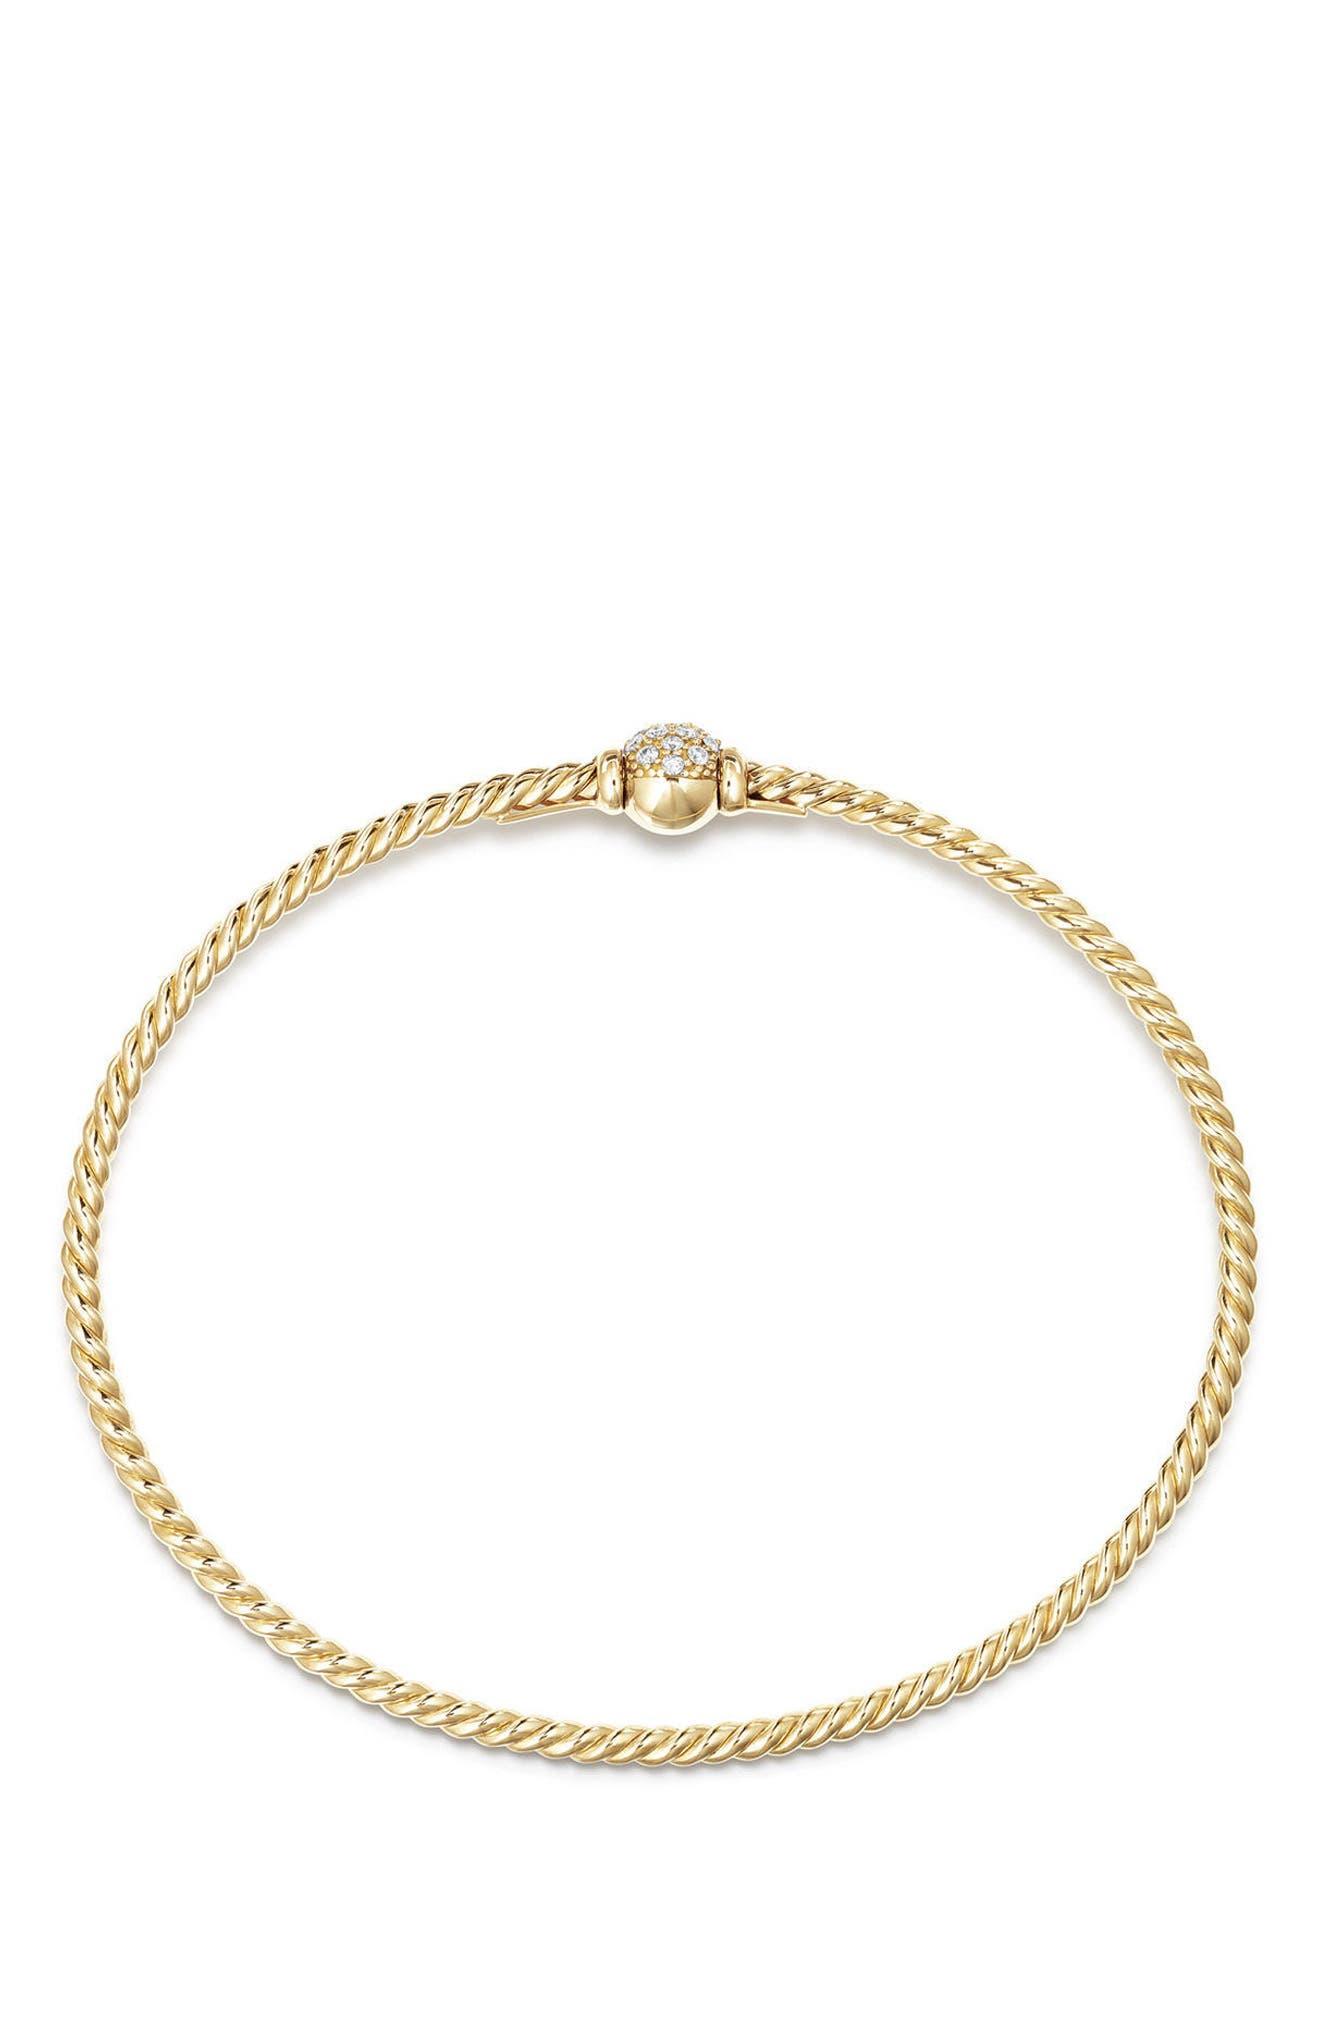 Solari Station Pavé Bracelet with Diamonds in 18K Gold,                             Alternate thumbnail 2, color,                             YELLOW GOLD/ DIAMOND